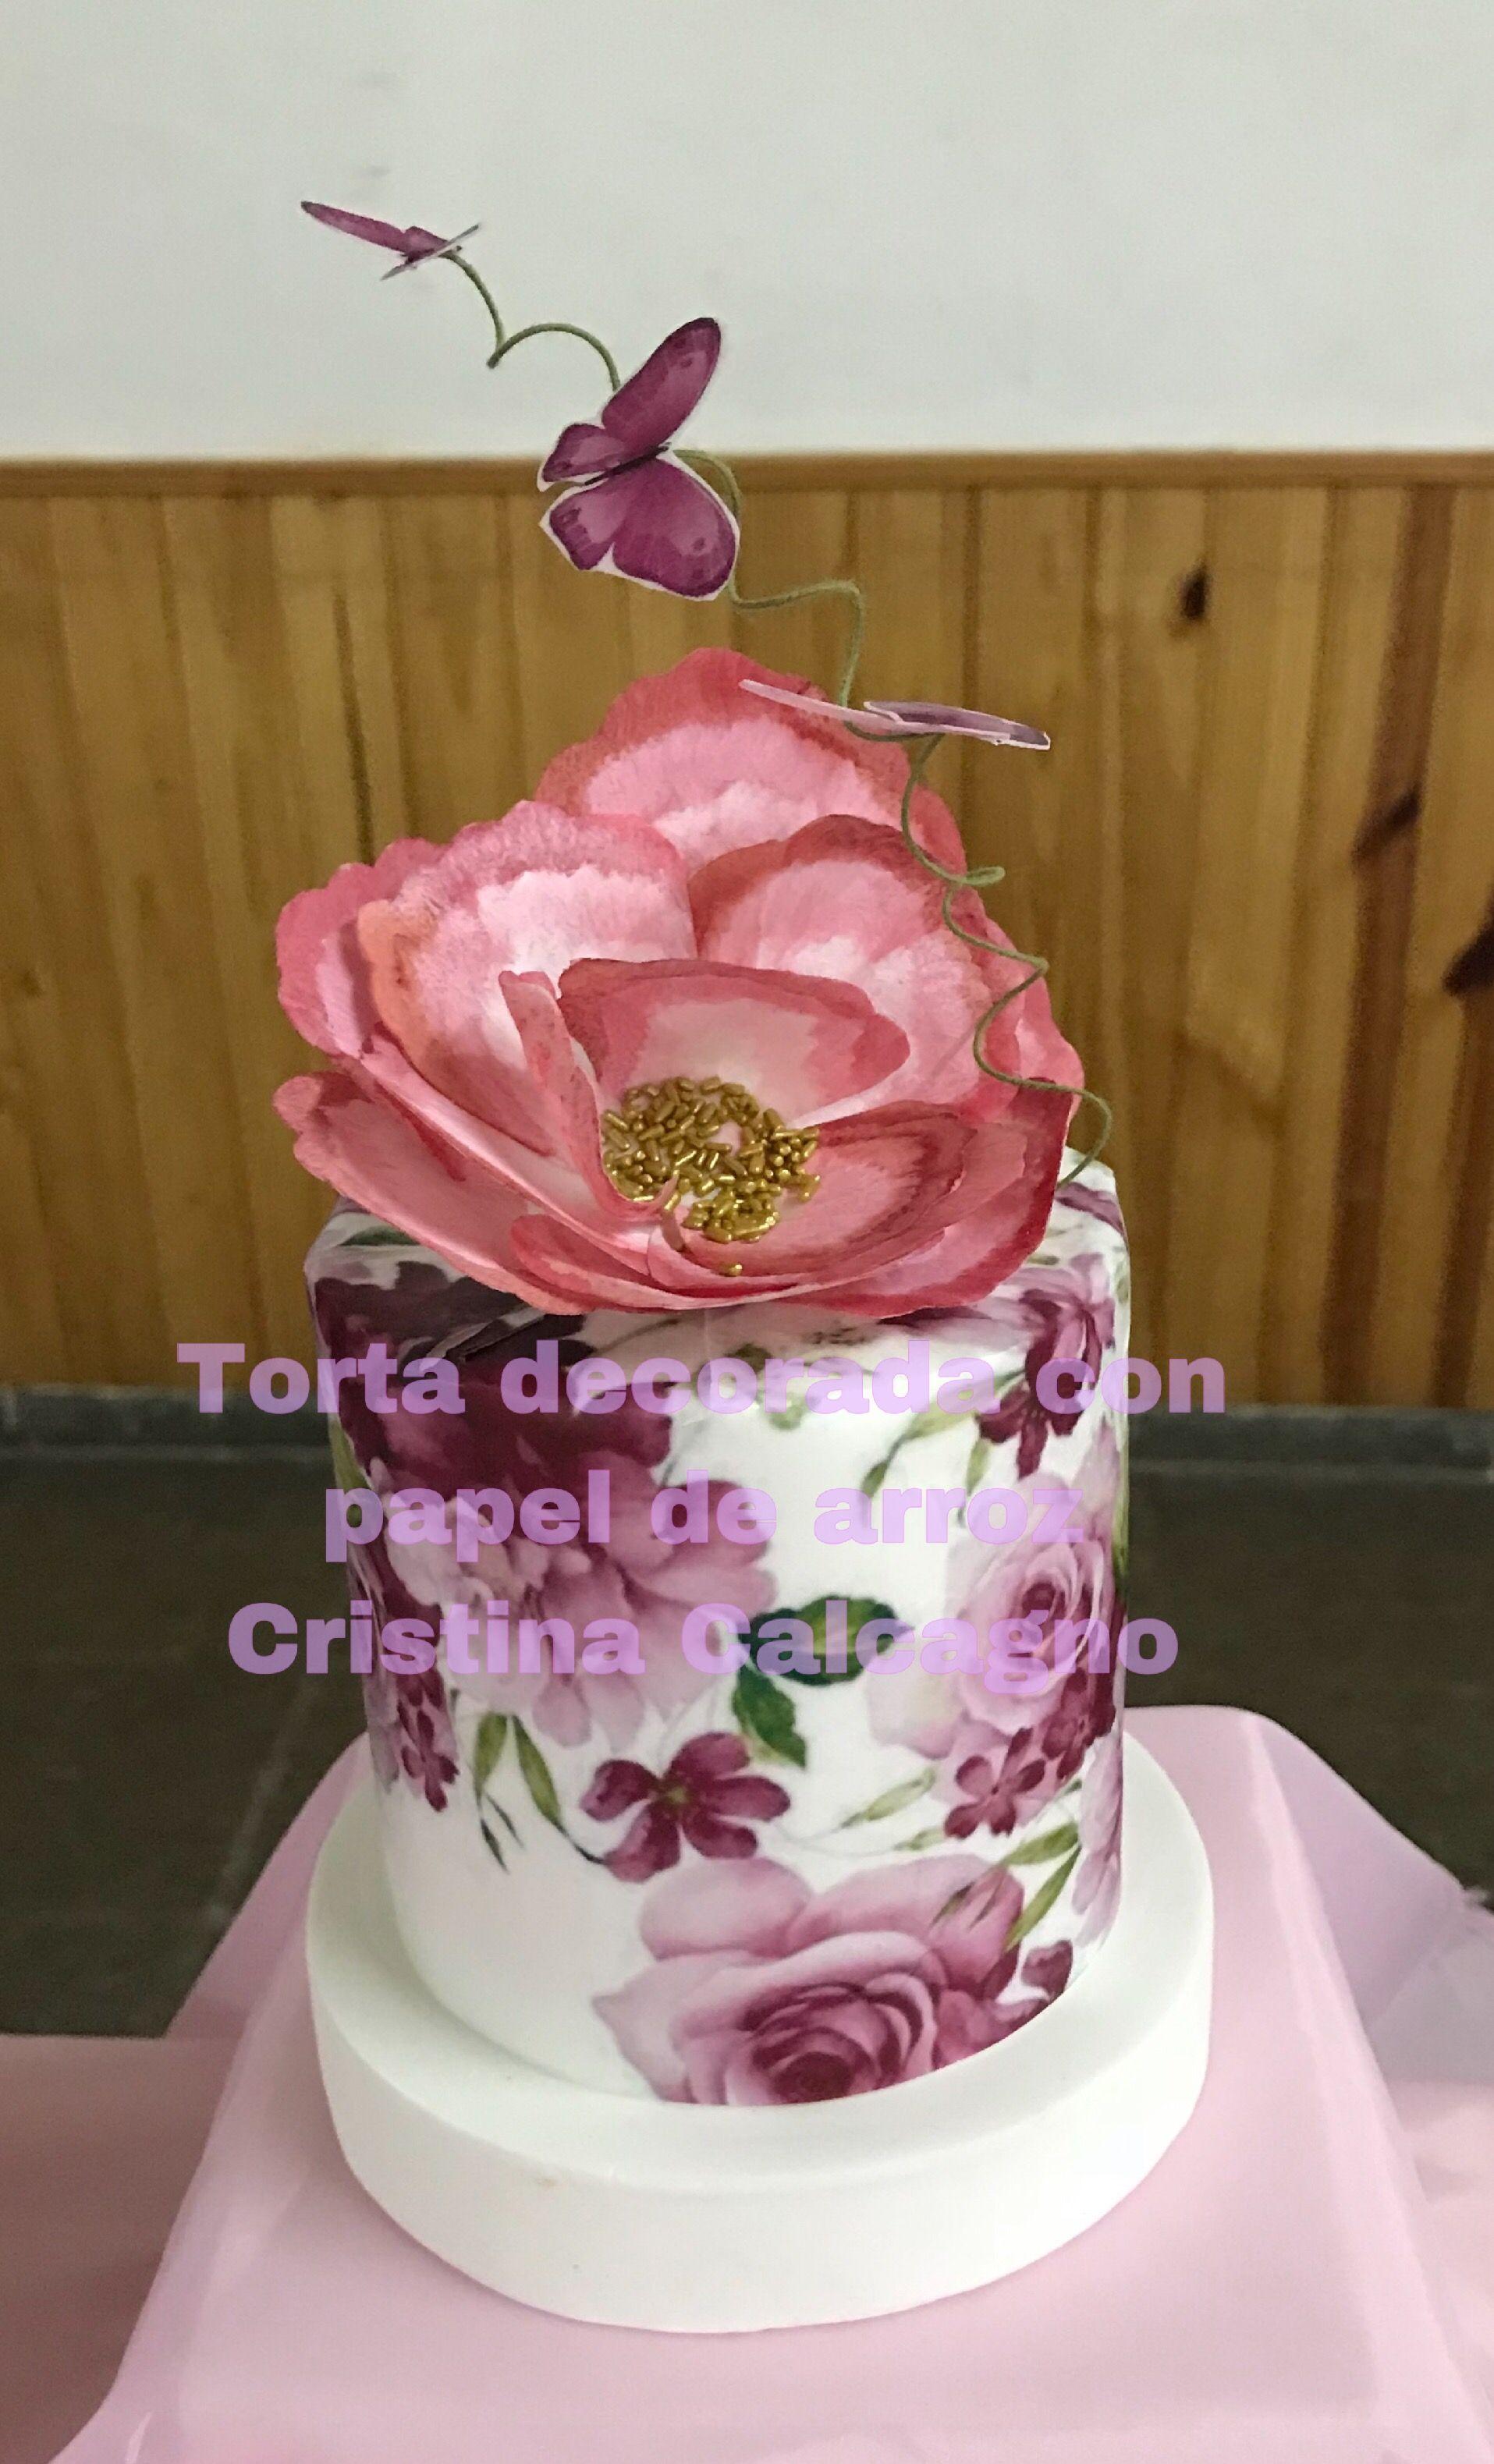 Torta Decorada Con Papel De Arroz Painted Cakes Beautiful Birthday Cakes Dessert Decoration